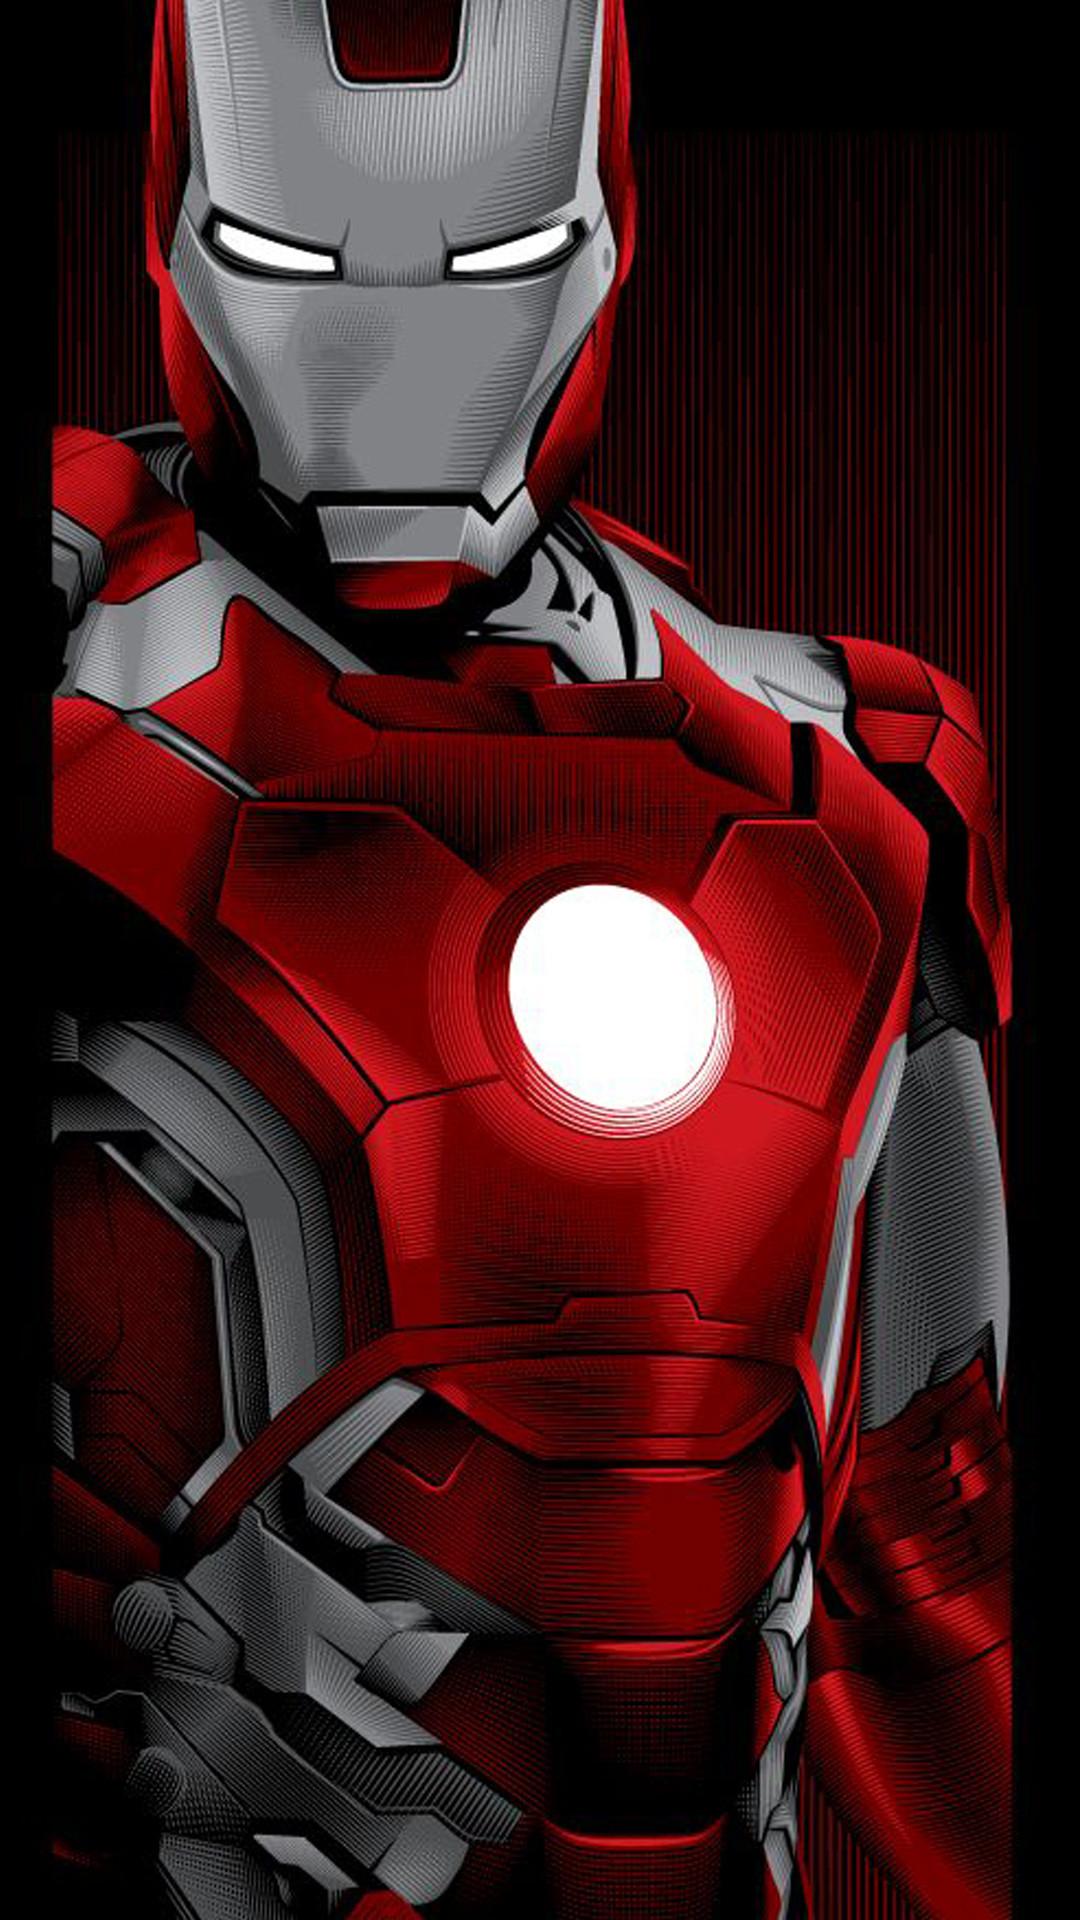 Iron Man cloud 9 iphone wallpaper